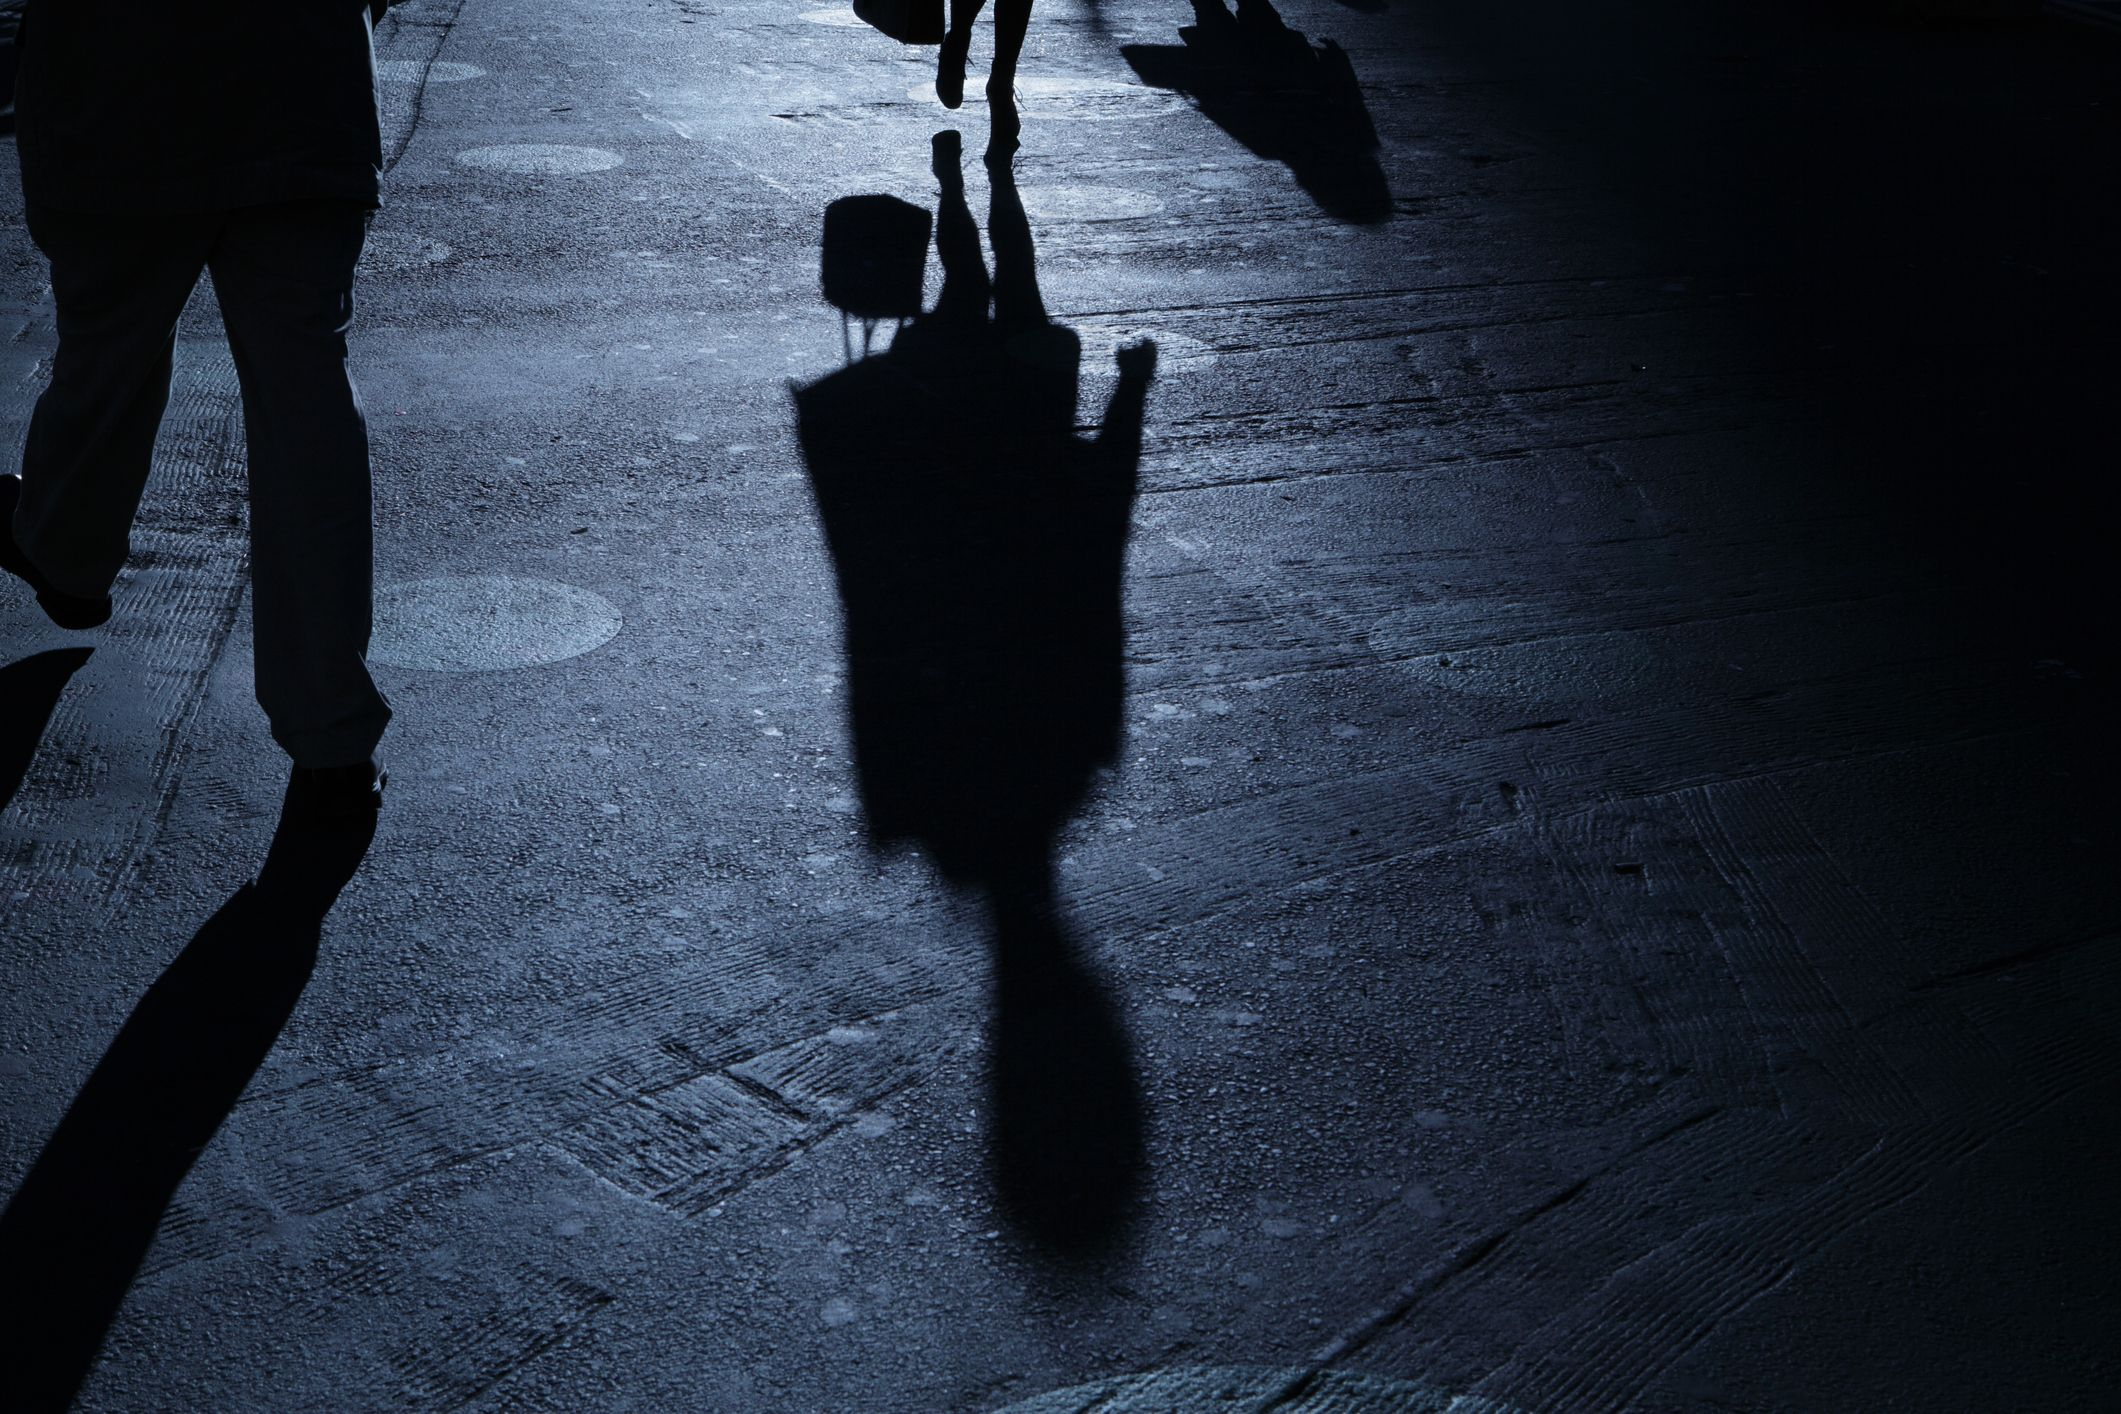 person walking alone at night